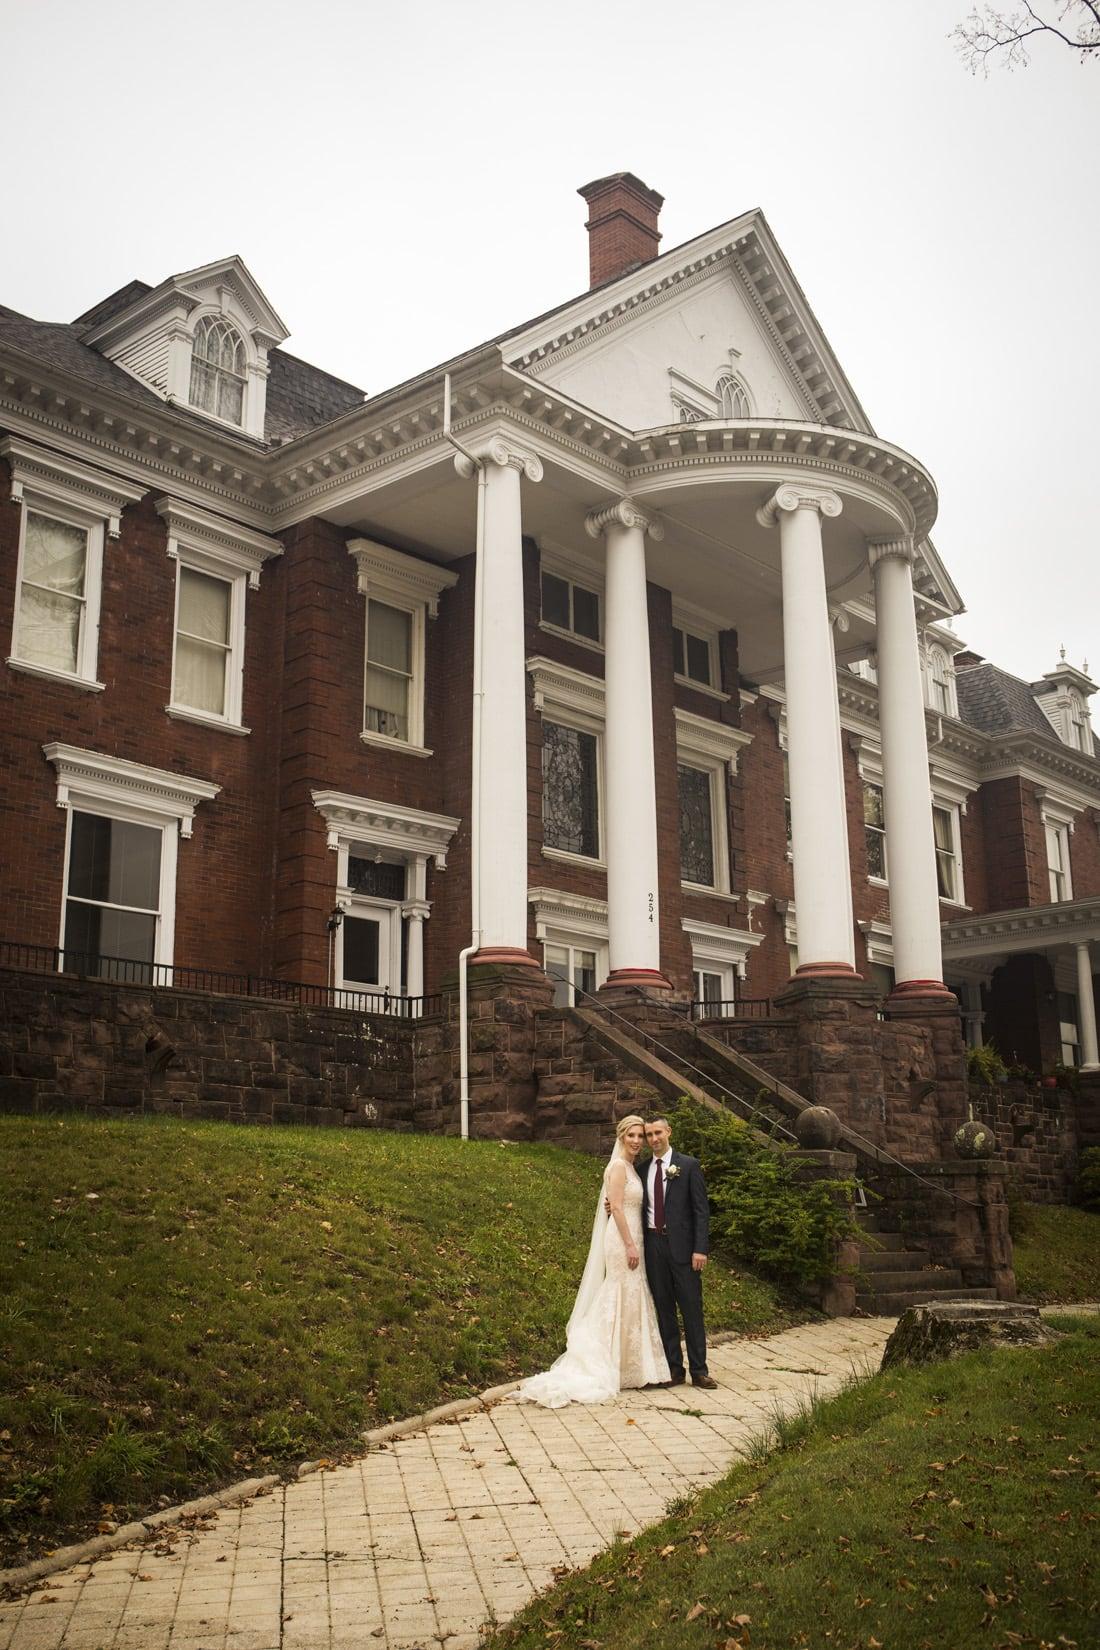 Hastings Mansion, Bellefonte, PA - Bob Lambert Photography